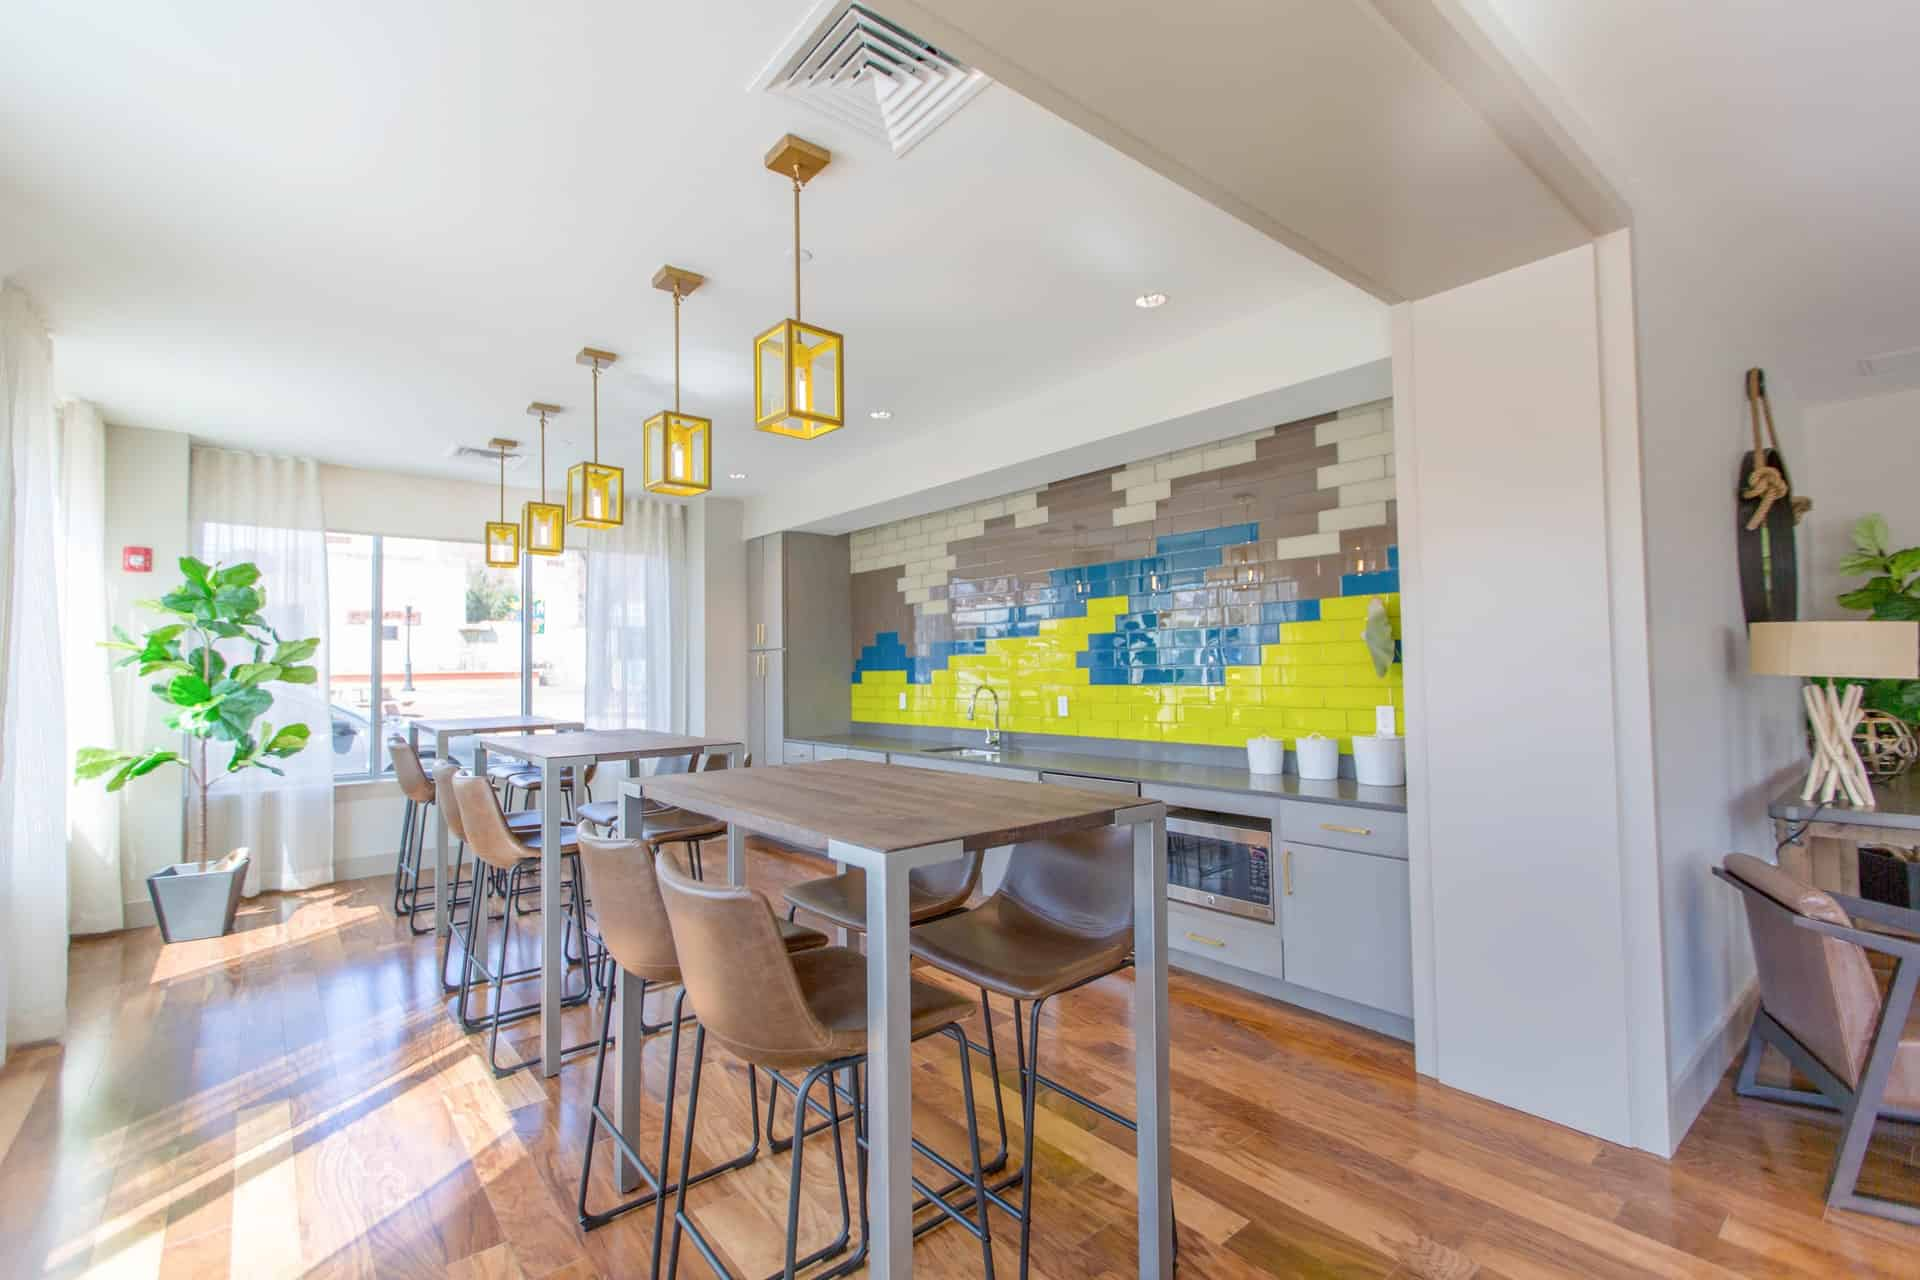 30 Modern Kitchen Floor Tile Ideas Stylish Design Pictures